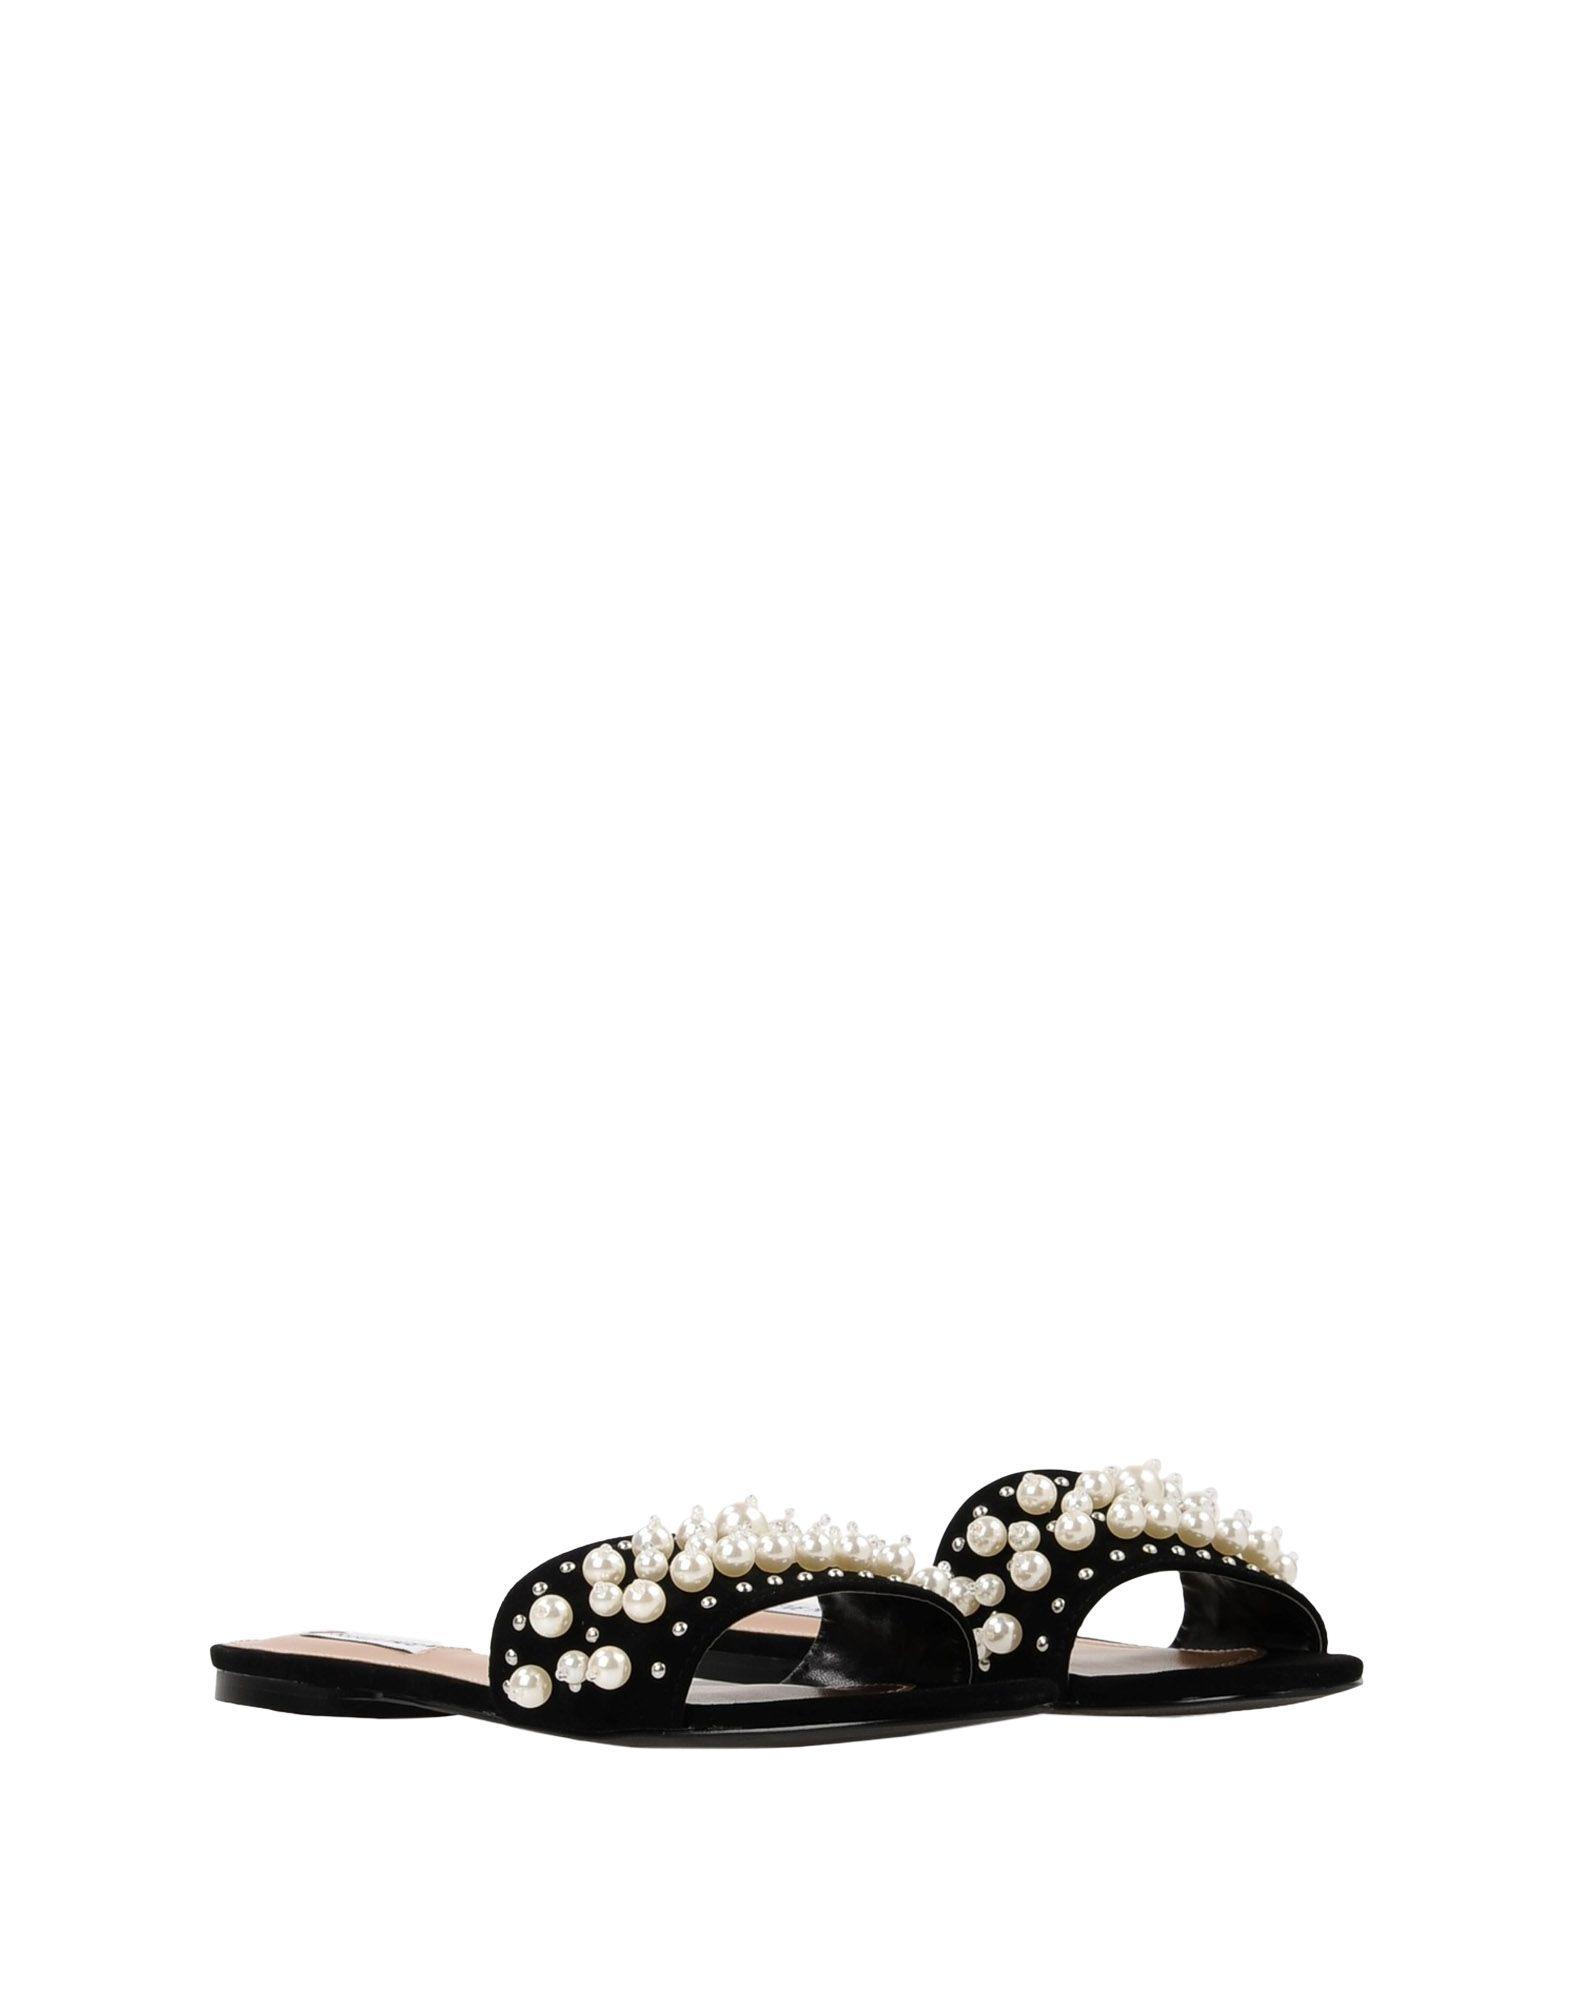 Steve Madden Vanessa Women Slipper - Sandals - Women Vanessa Steve Madden Sandals online on  Canada - 11436903WL dee324